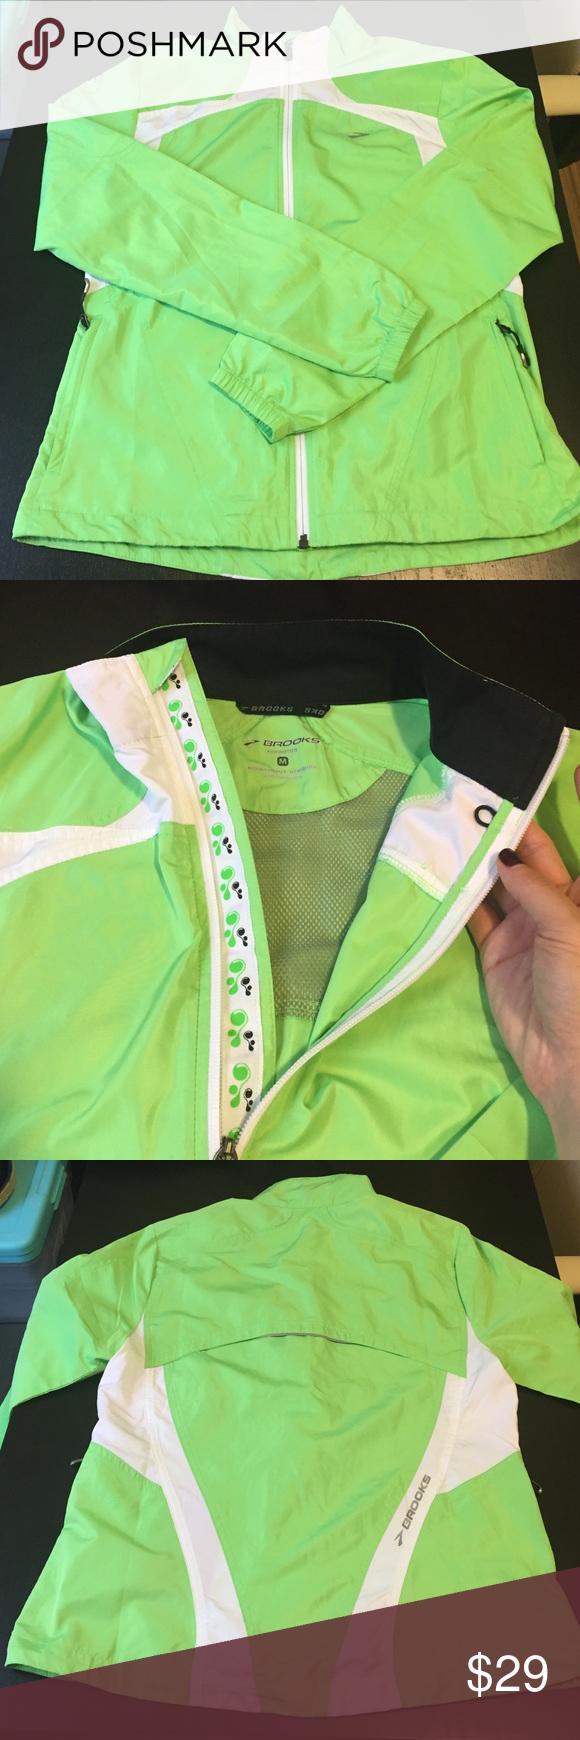 Brookes Running Jacket Brooks Shelter Technology 100 Polyester Worn Once Brooks Jackets Coats Running Jacket Clothes Design Jackets